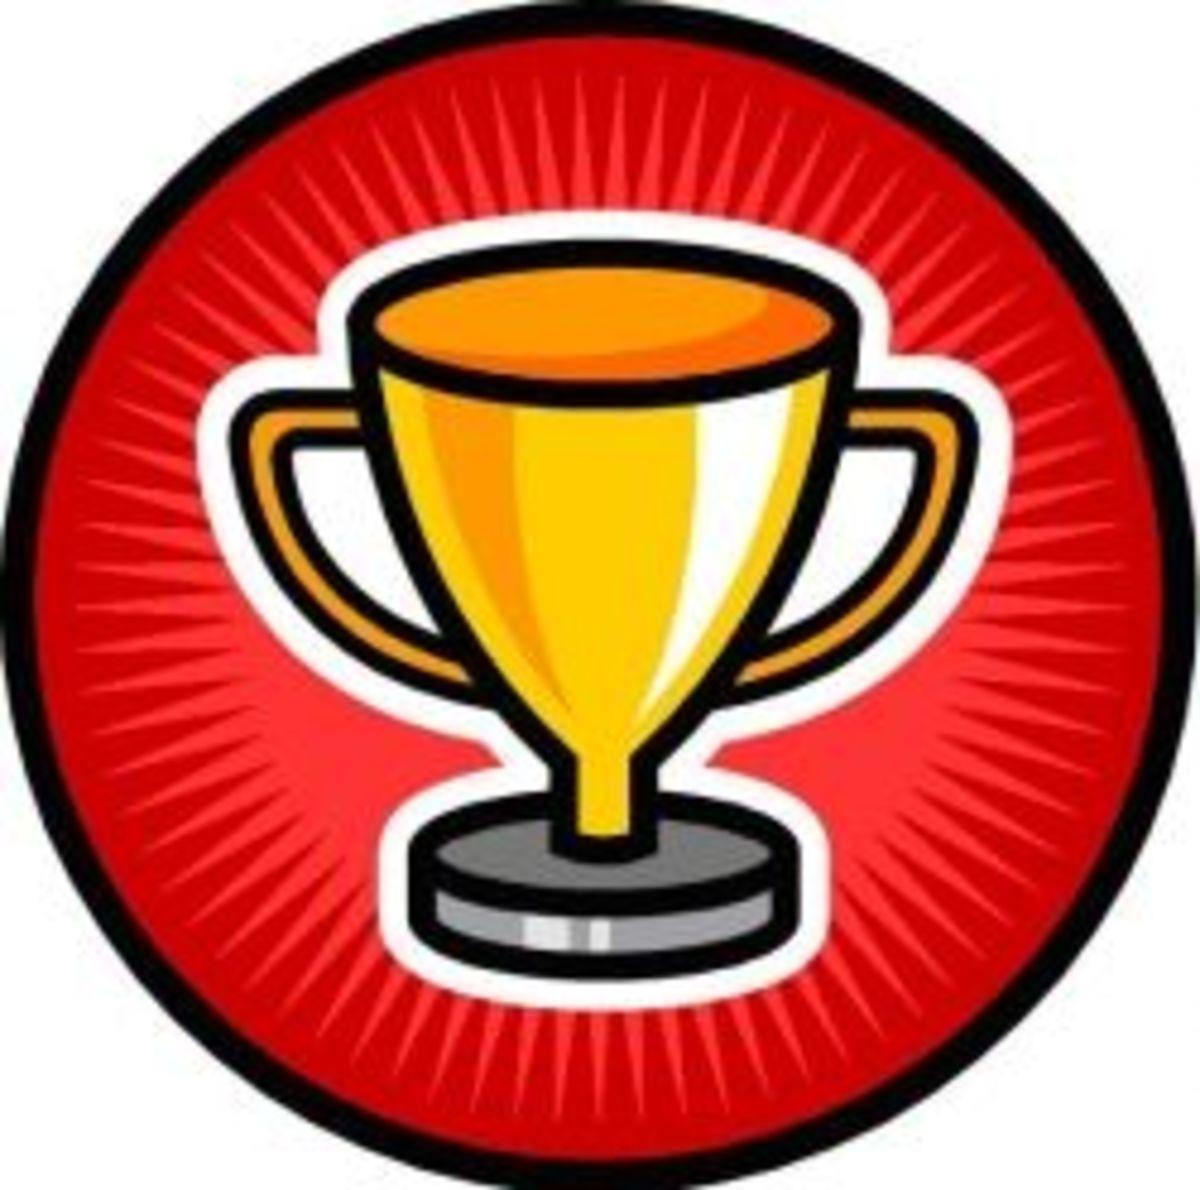 Star Nosed Mole Special Award